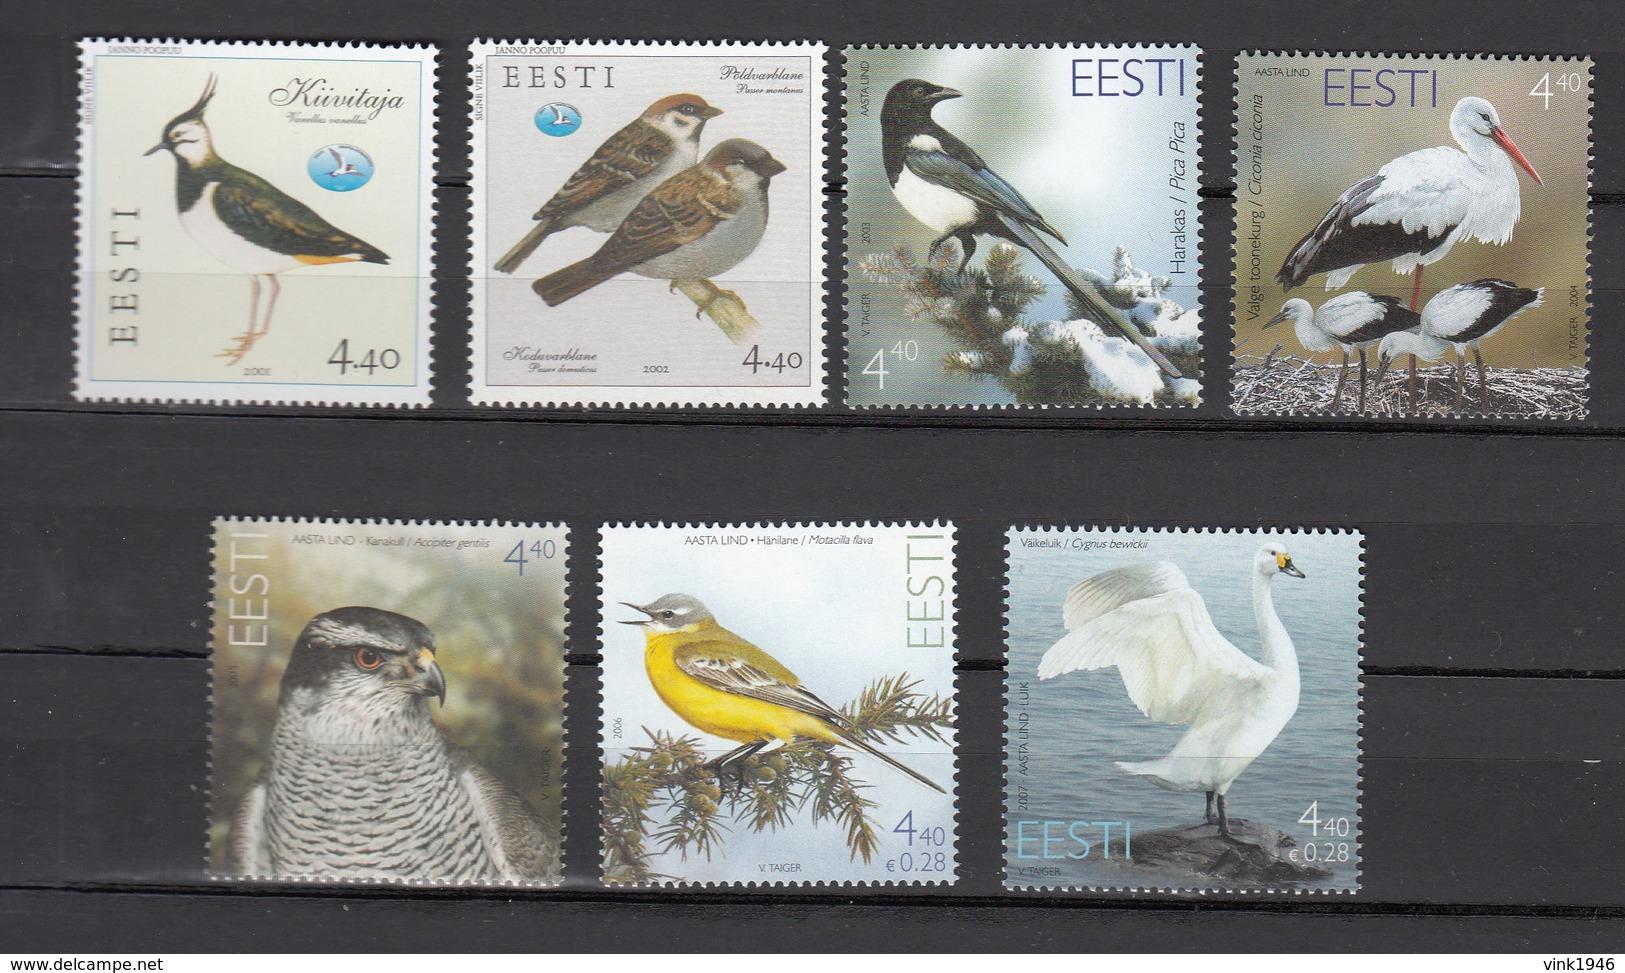 Estonia 2001,2,3,4,5,6,7,7V,birds,vogels,vögel,oiseaux,pajaros,uccelli,aves,MNH/Postfris,(A3470) - Oiseaux